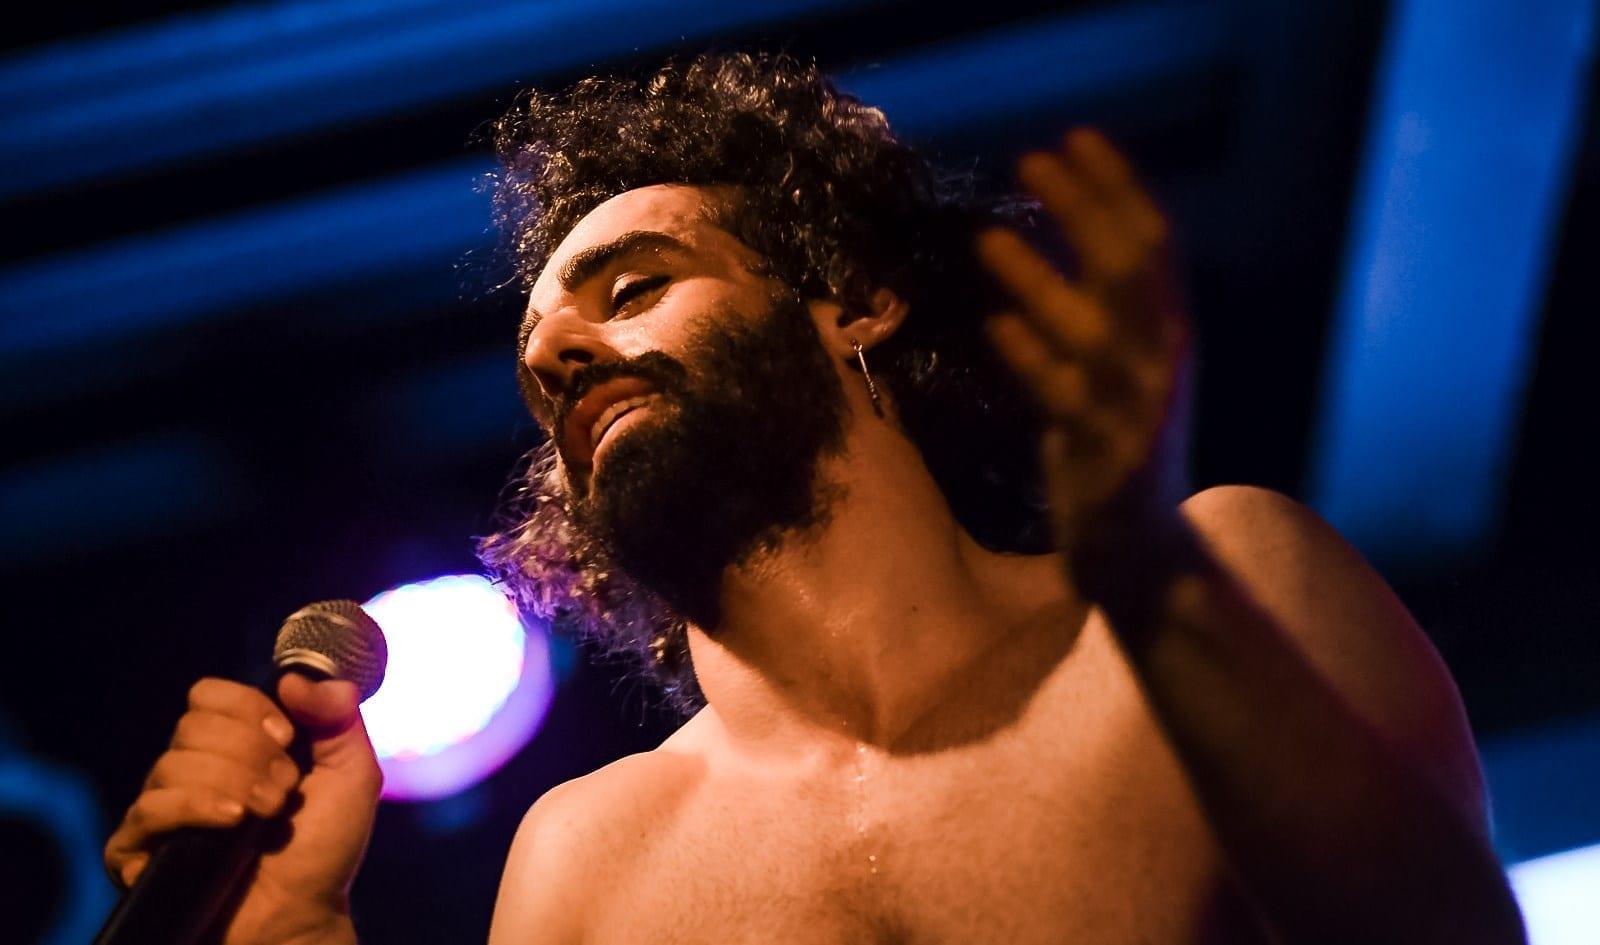 Outburst Queer Arts Festival Belfast